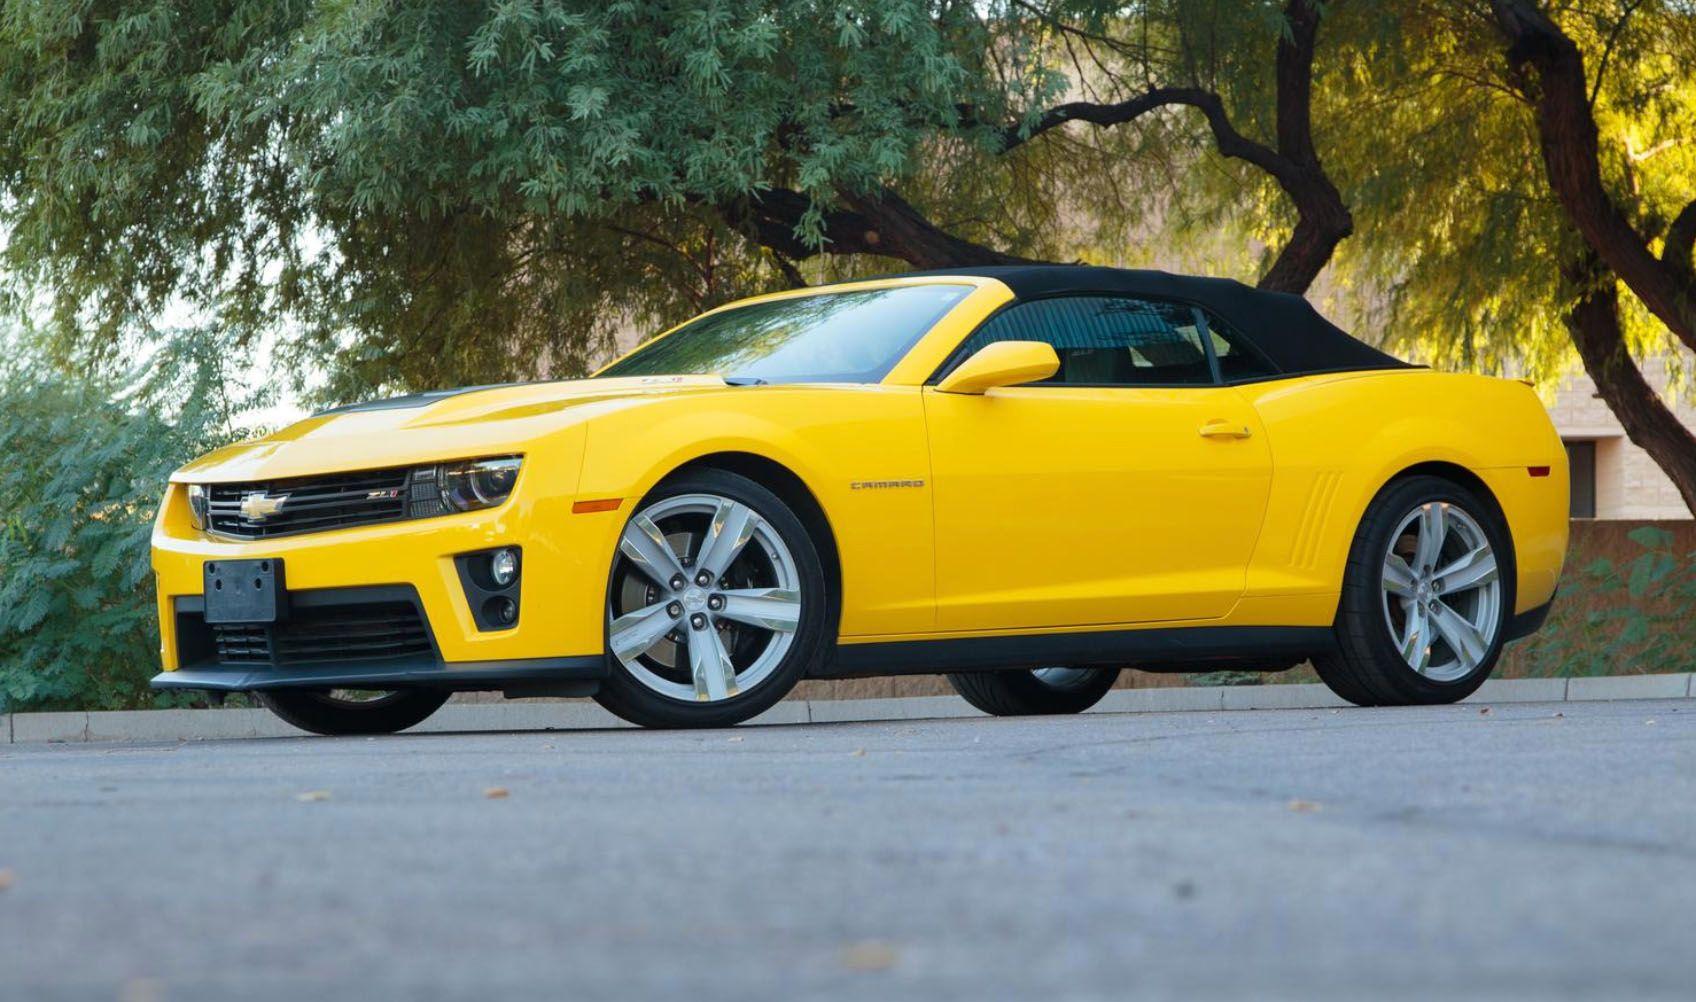 "<img src=""auction-2013-camaro-zl1.jpg"" alt=""A 2013 Chevrolet Camaro ZL1 convertible in rare Rally Yellow"">"